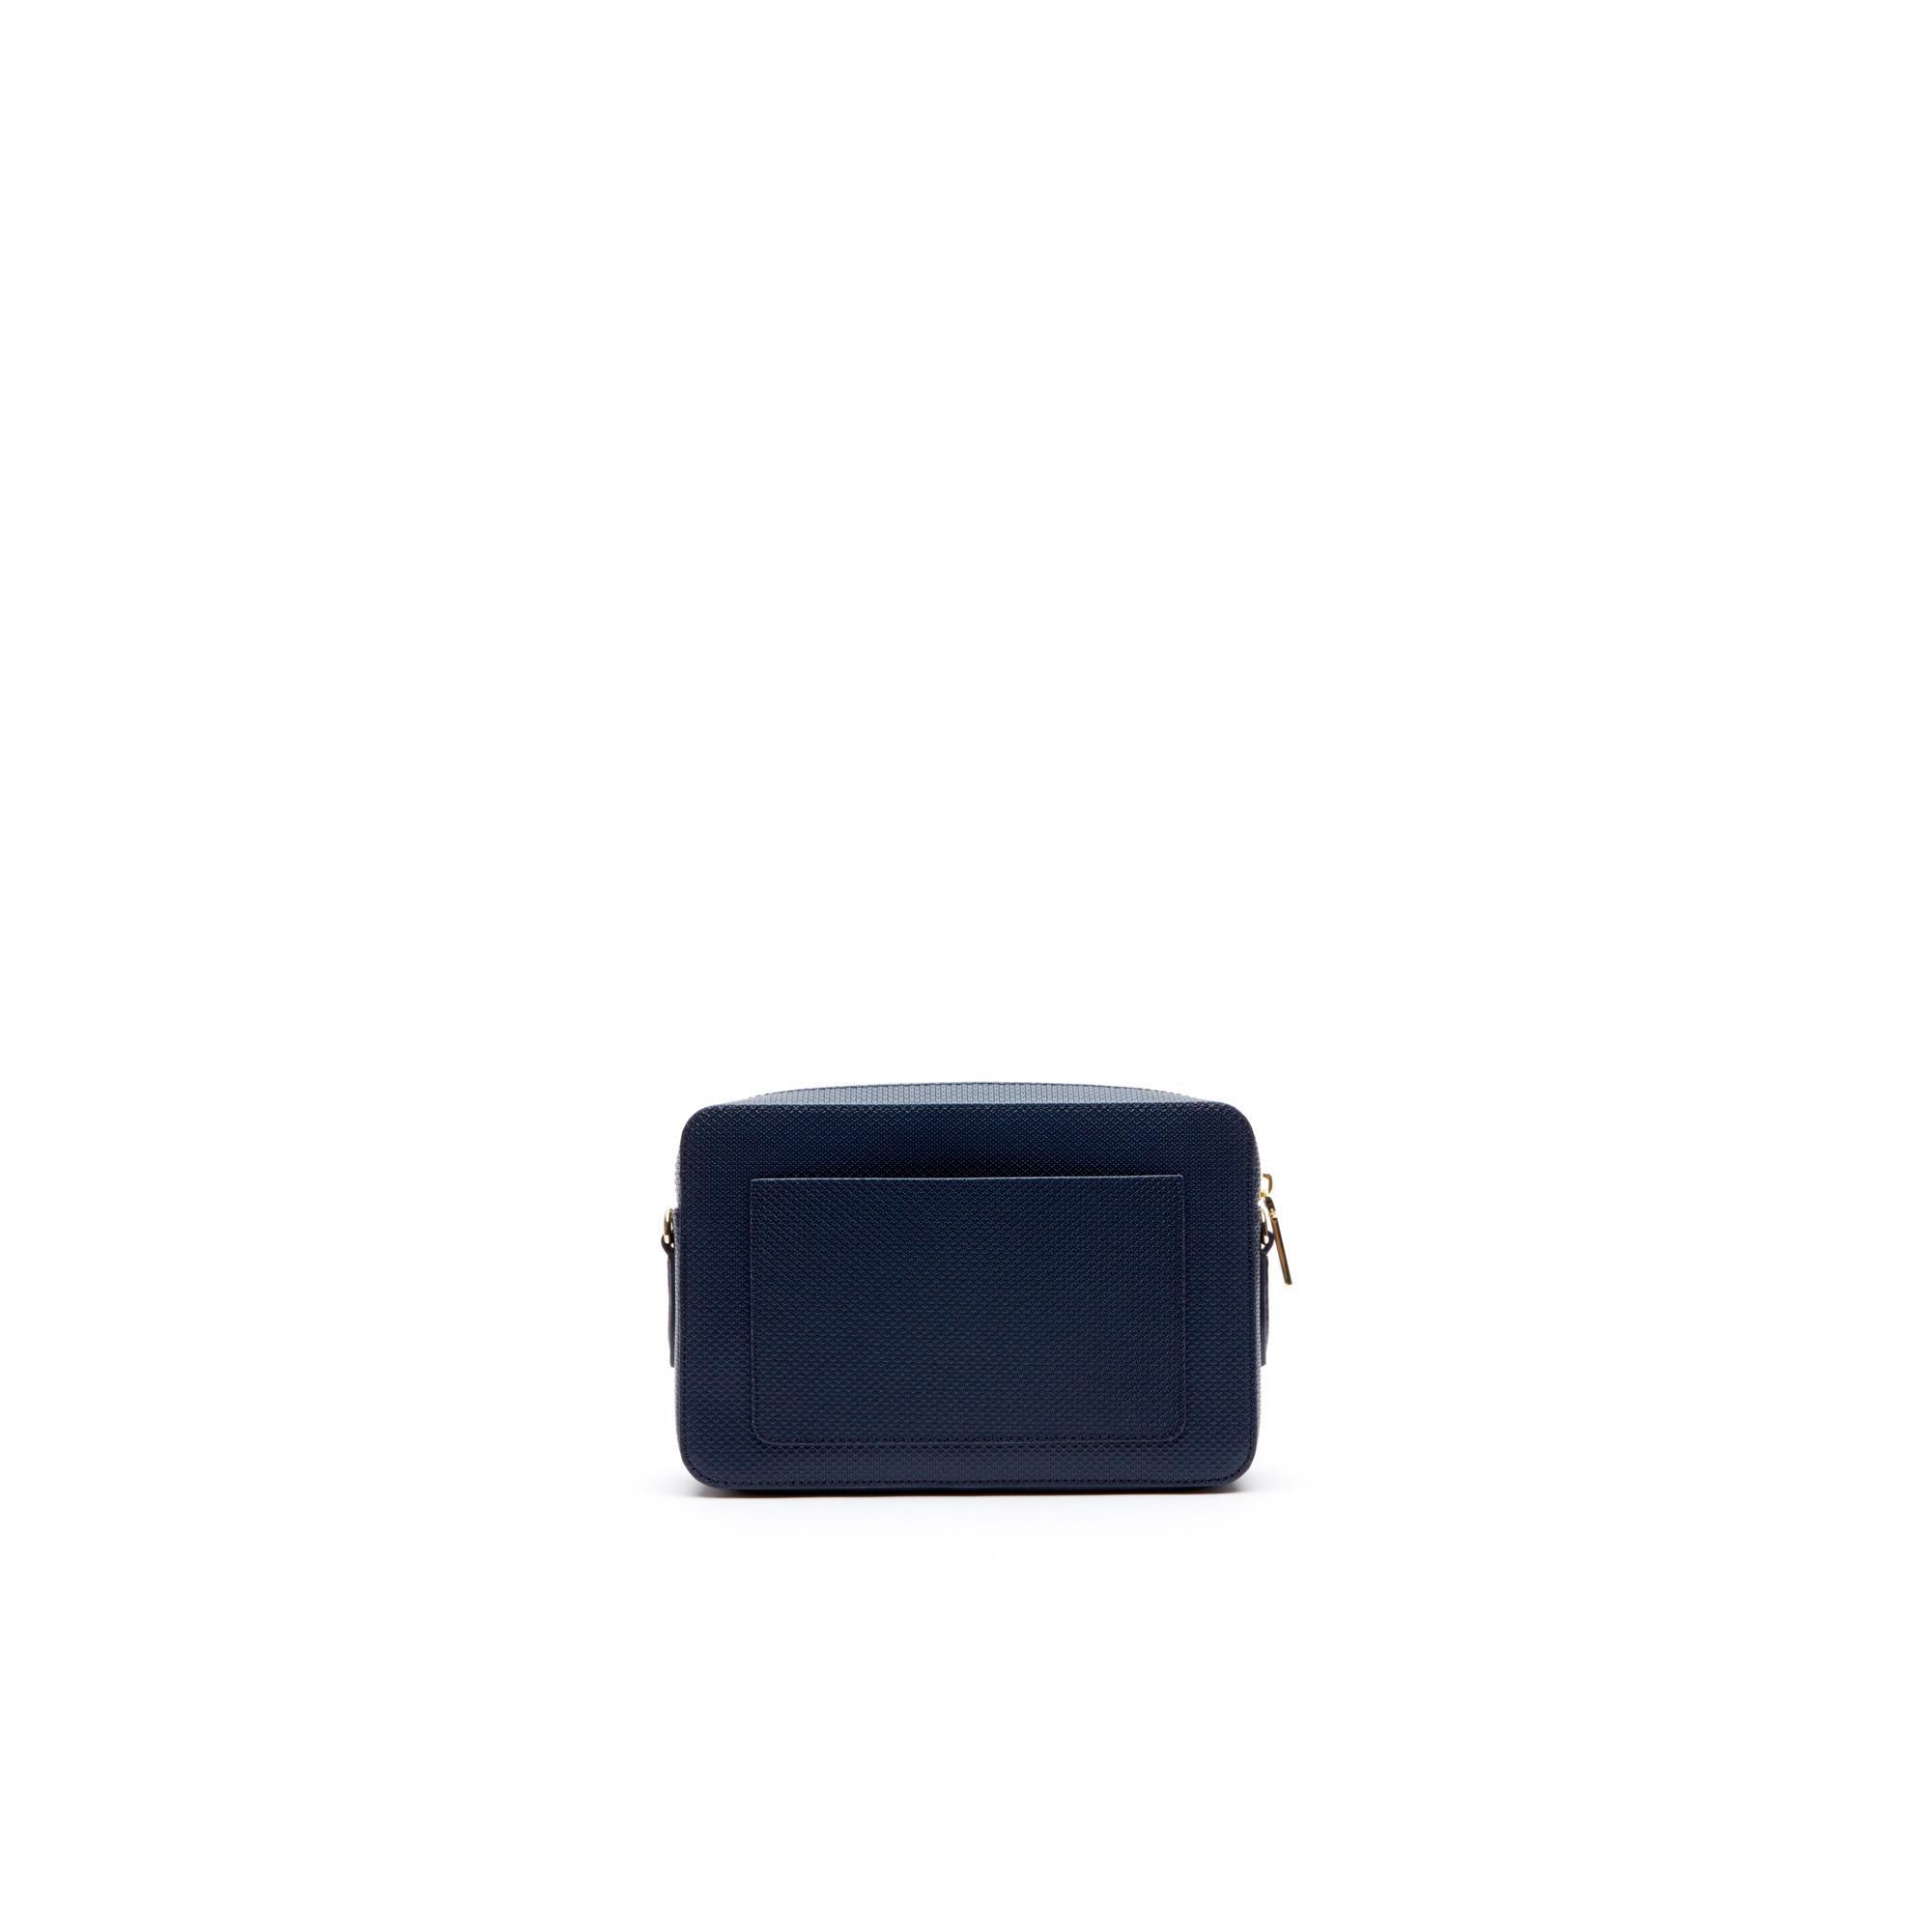 Lacoste Women's Navy Blue Bag